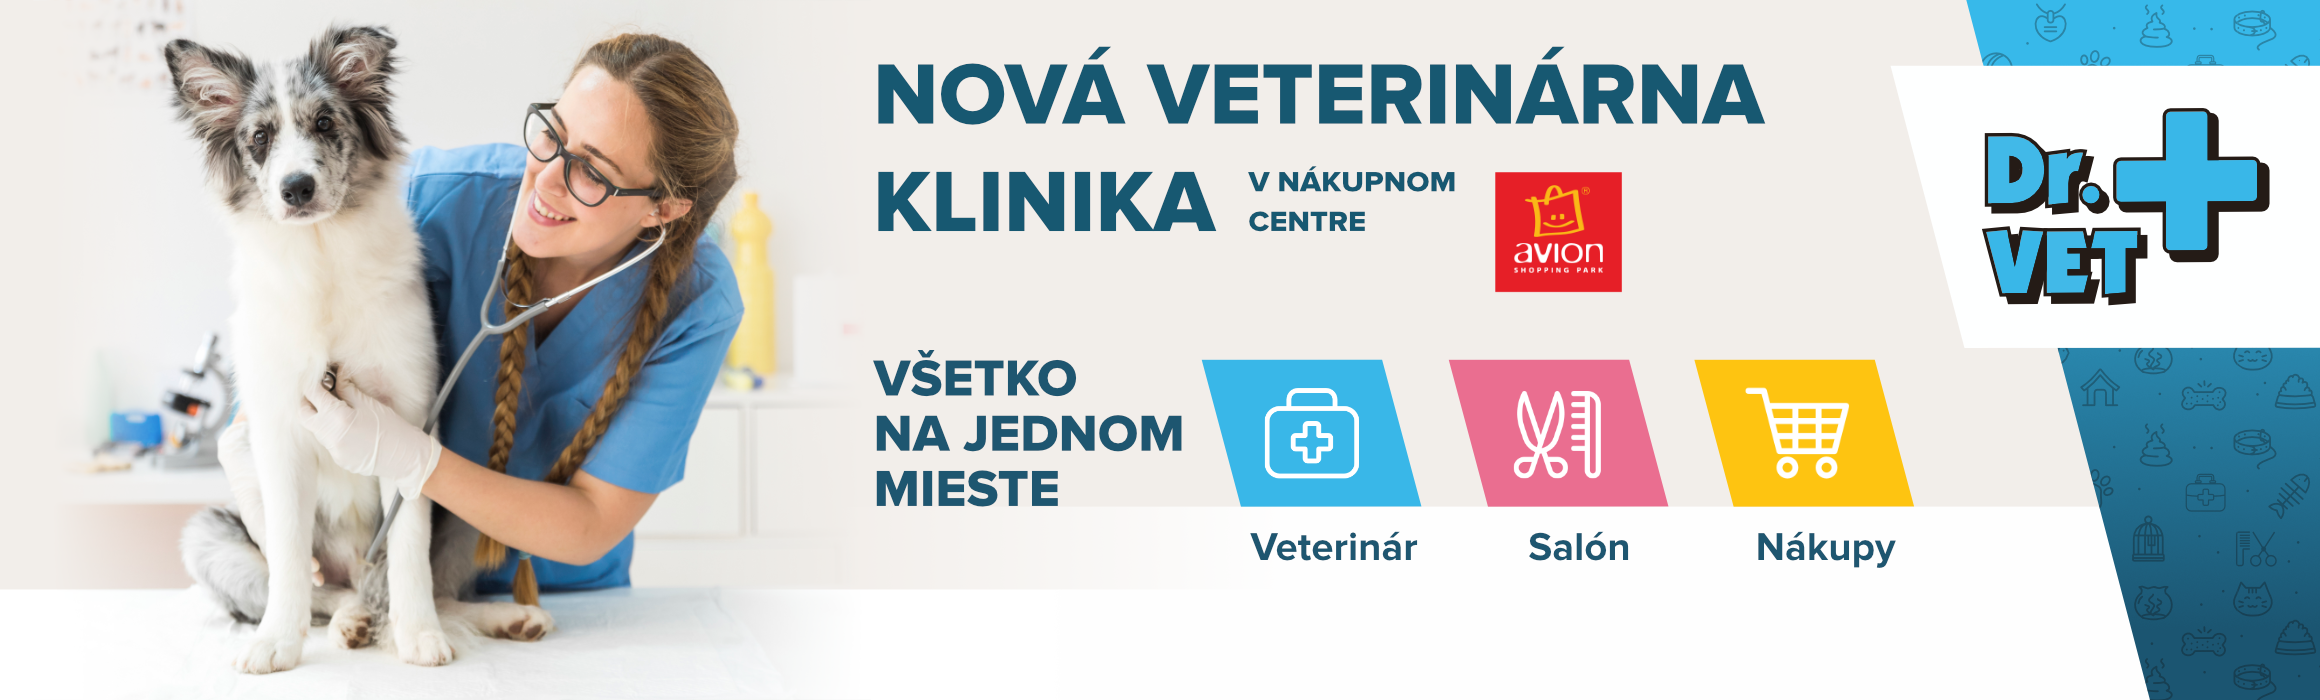 Dr. VET Veterinárna klinika